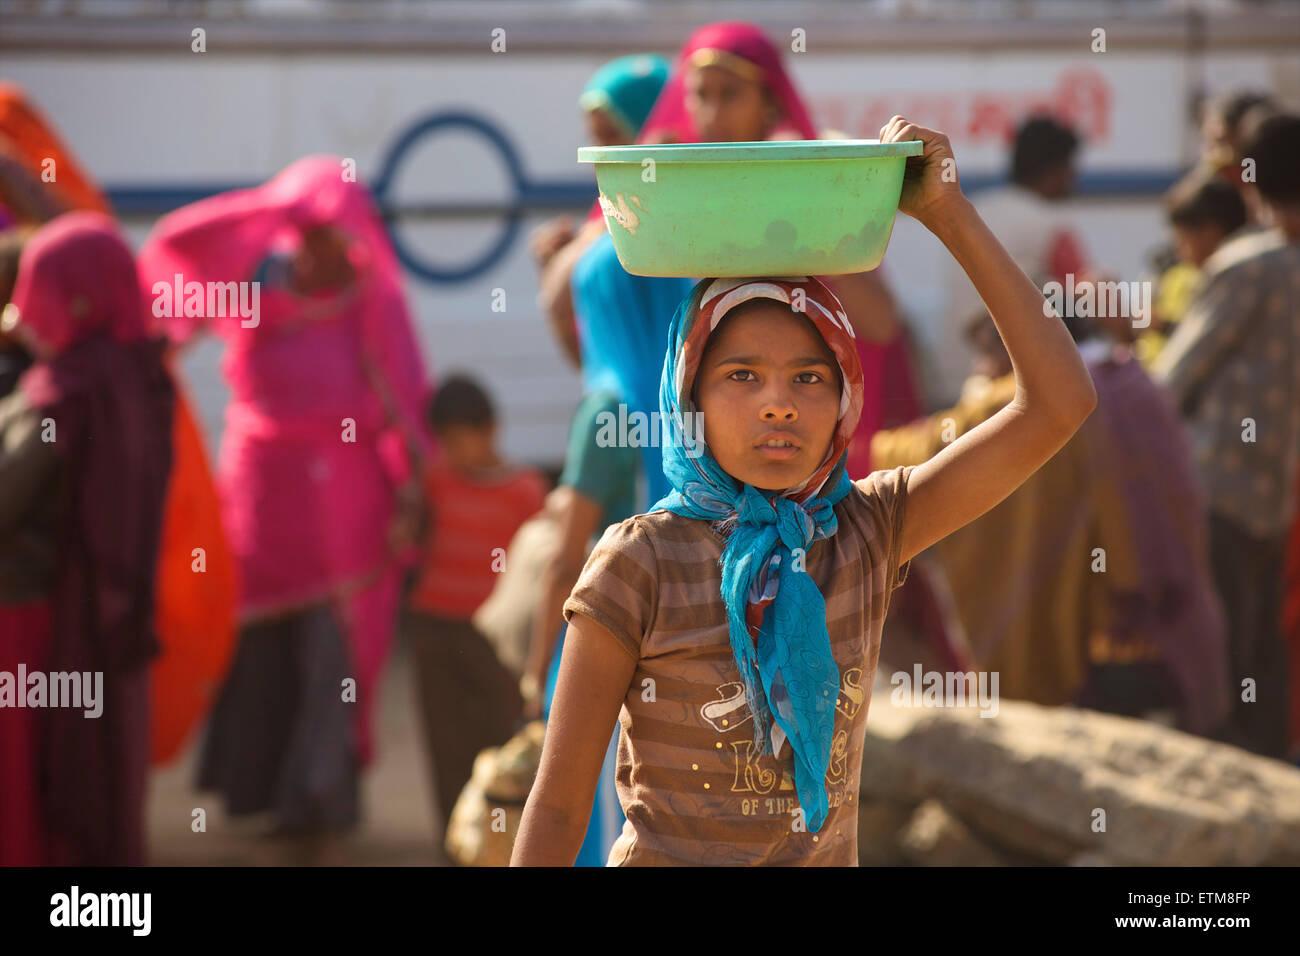 Indian girl collecting camel dung in a green bowl. Pushkar Camel Fair, Rajasthan, India - Stock Image